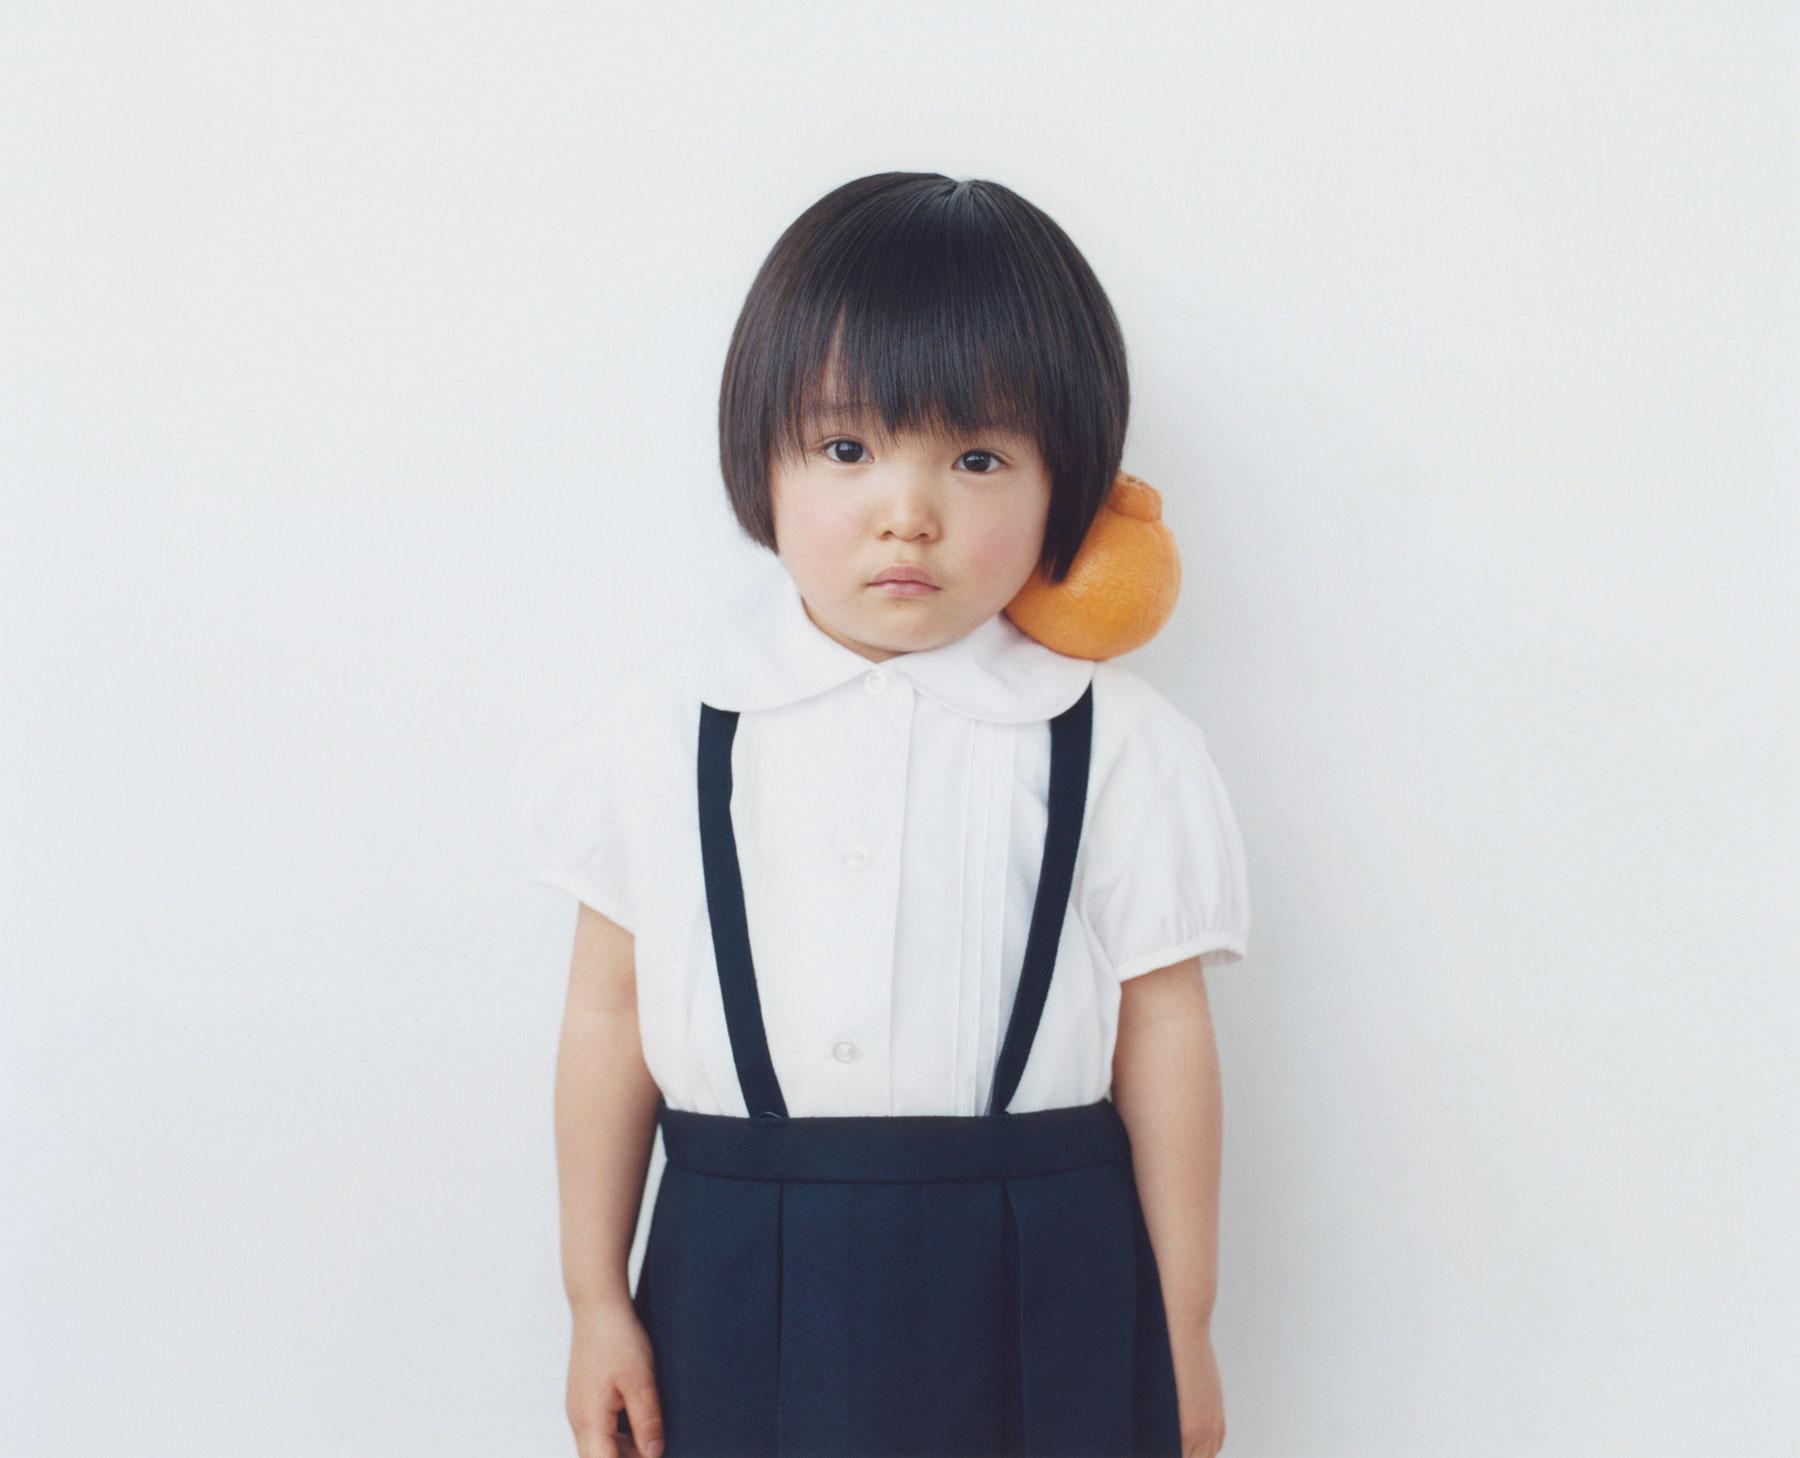 Osamu Yokonami,  1000 Children: Sumo Mandarin No. 53 , 2010-2013  Digital pigment print, 895 x 1105 mm (approx. 34.25 x 43.5 in), edition of 5; 146 x 168 mm (approx. 5.75 x 6.6 in), edition of 10   Inquire